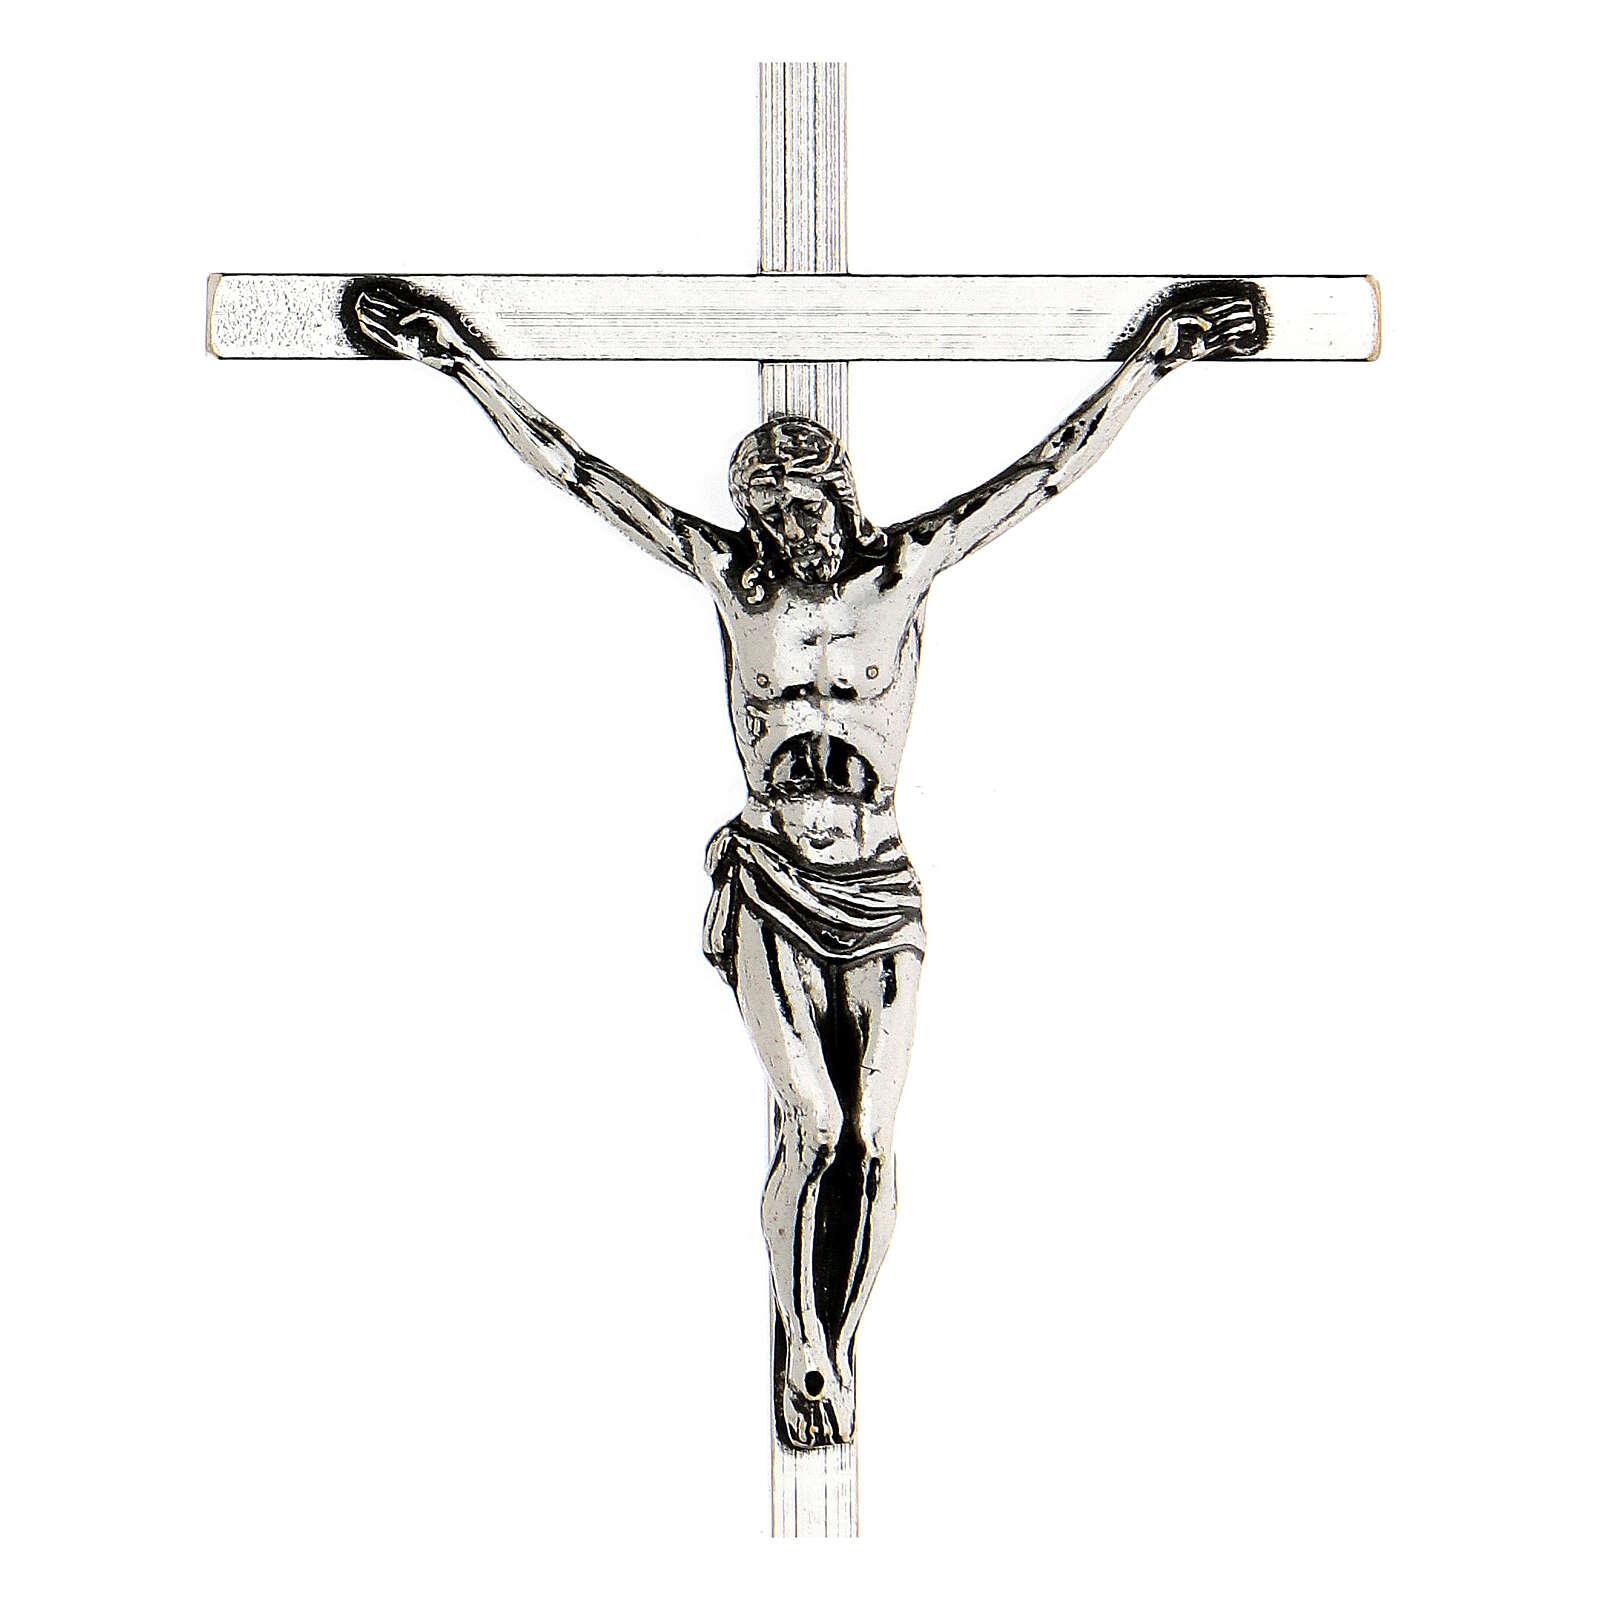 Croce pettorale argentata crocifisso 10x6,5 cm 3